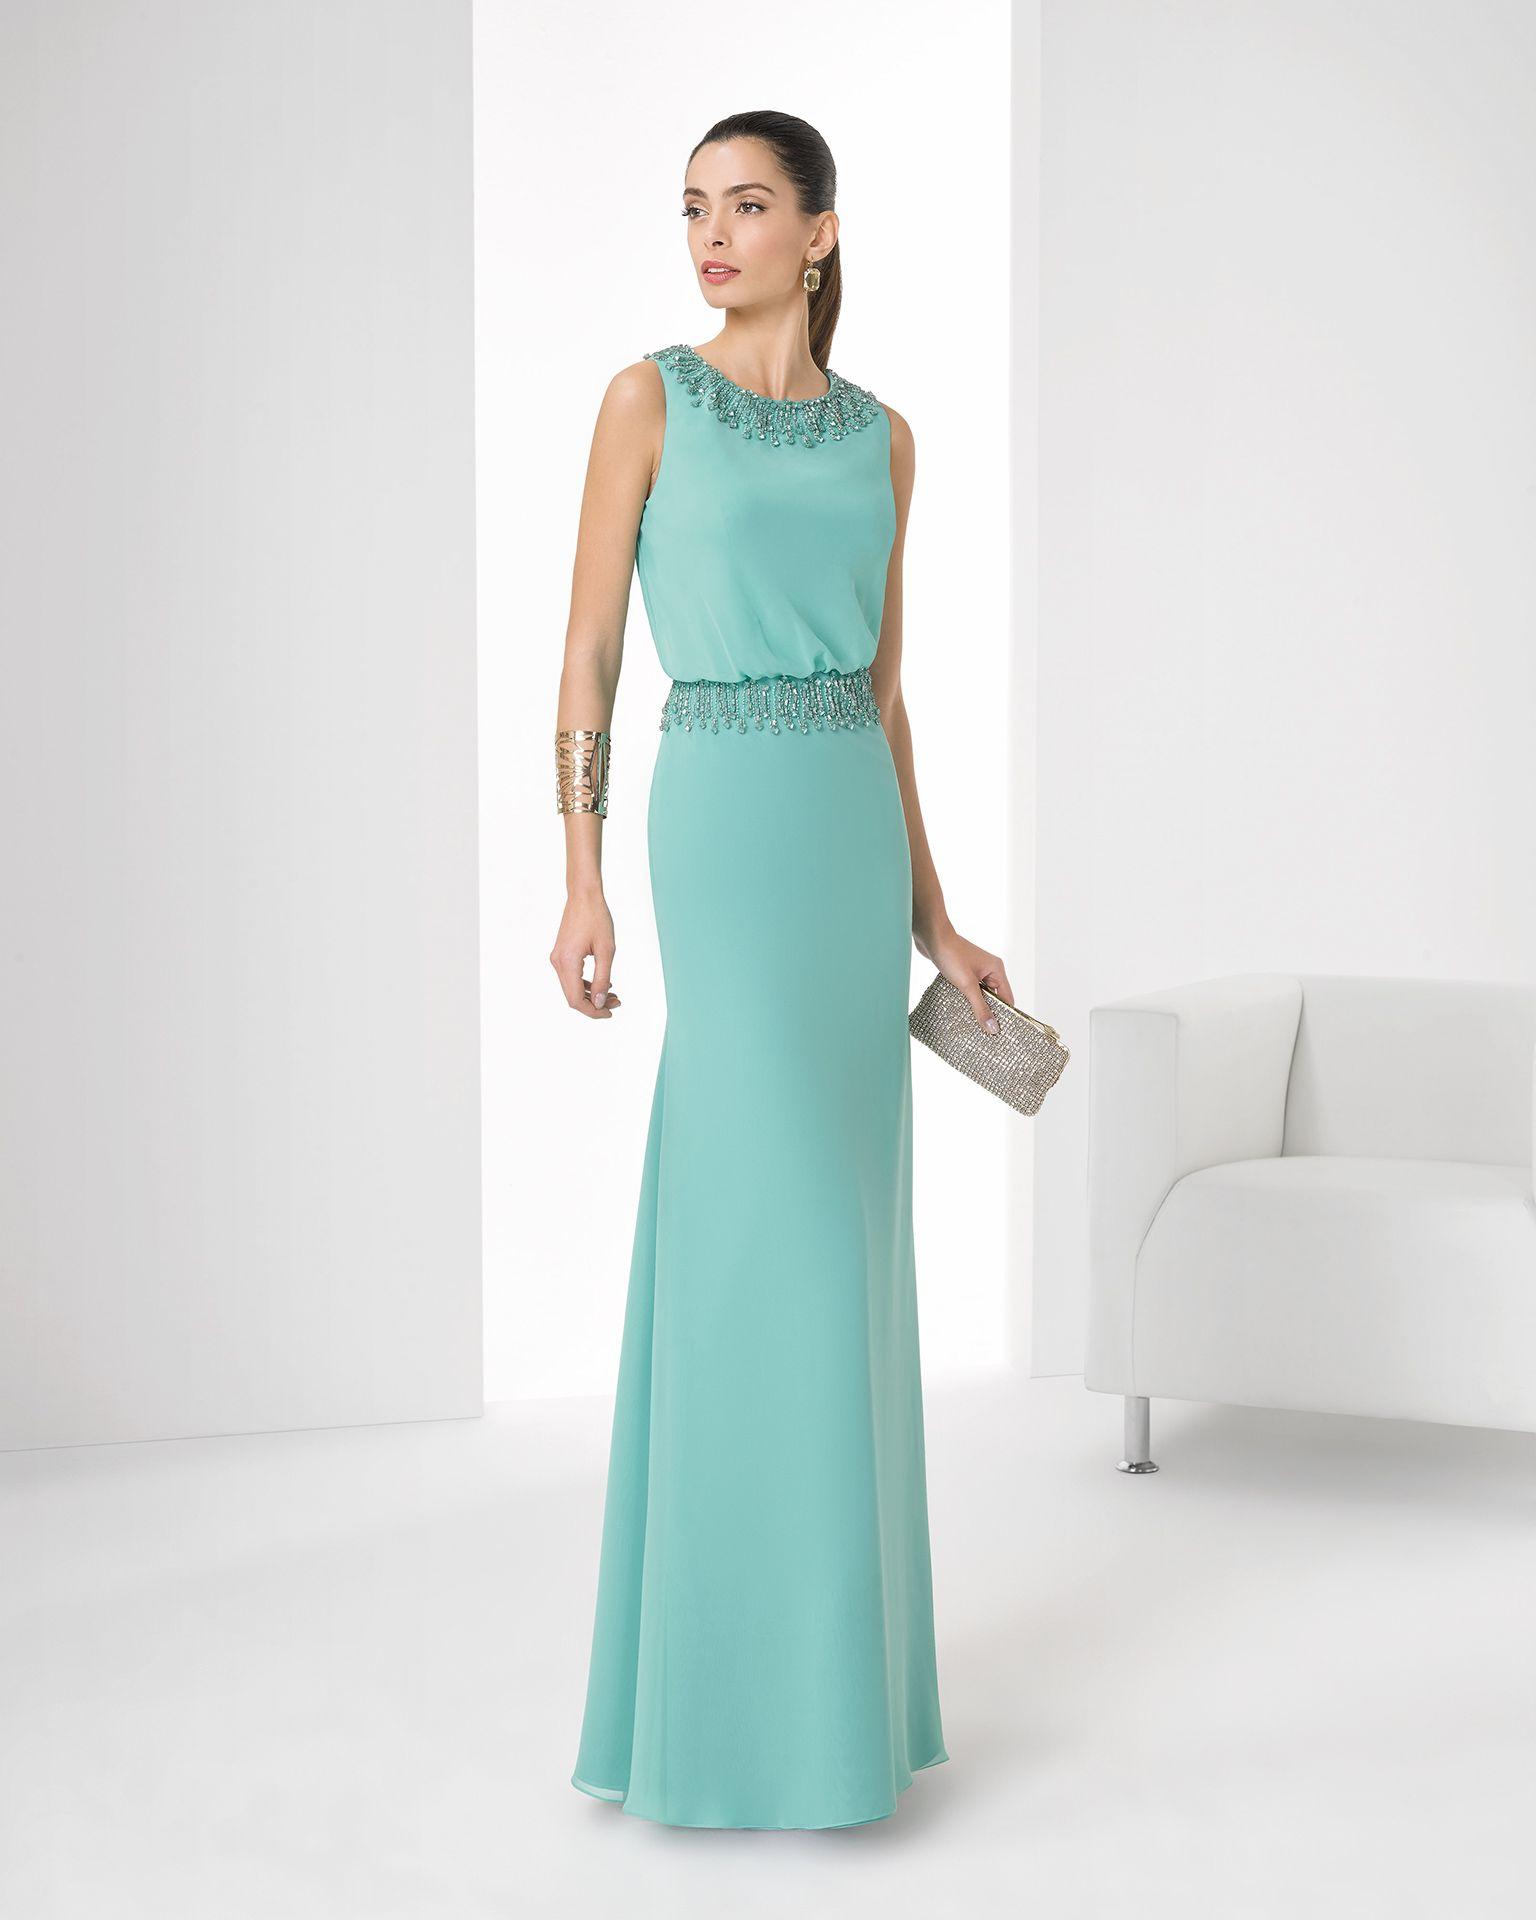 Vestidos de gala - Colección 2016 de Rosa Clará | Vestido para bodas ...